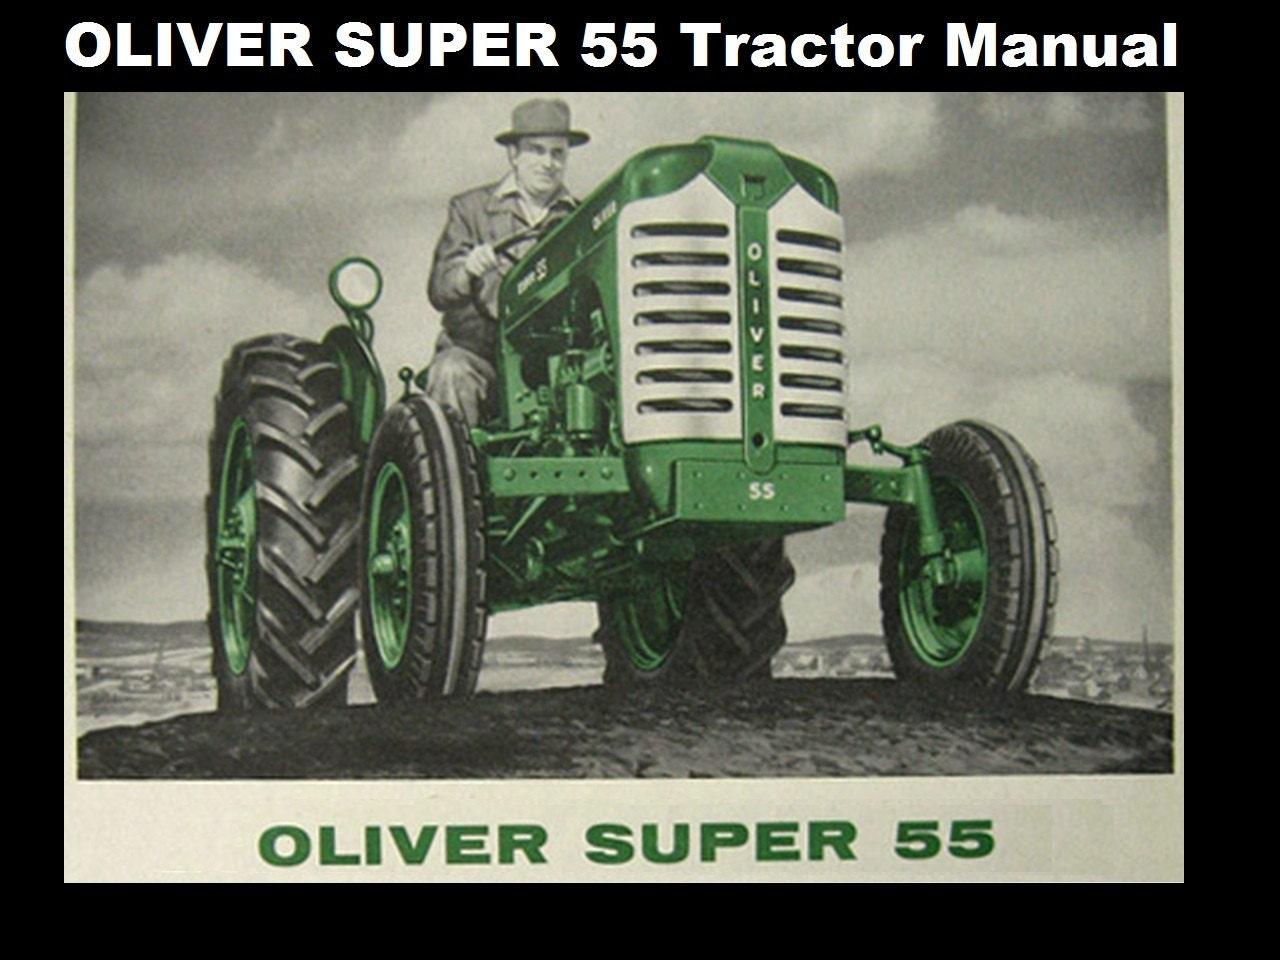 Oliver Super 55 Wiring Diagram | Wiring Liry on oliver ignition diagram, oliver tractor, oliver parts diagram,